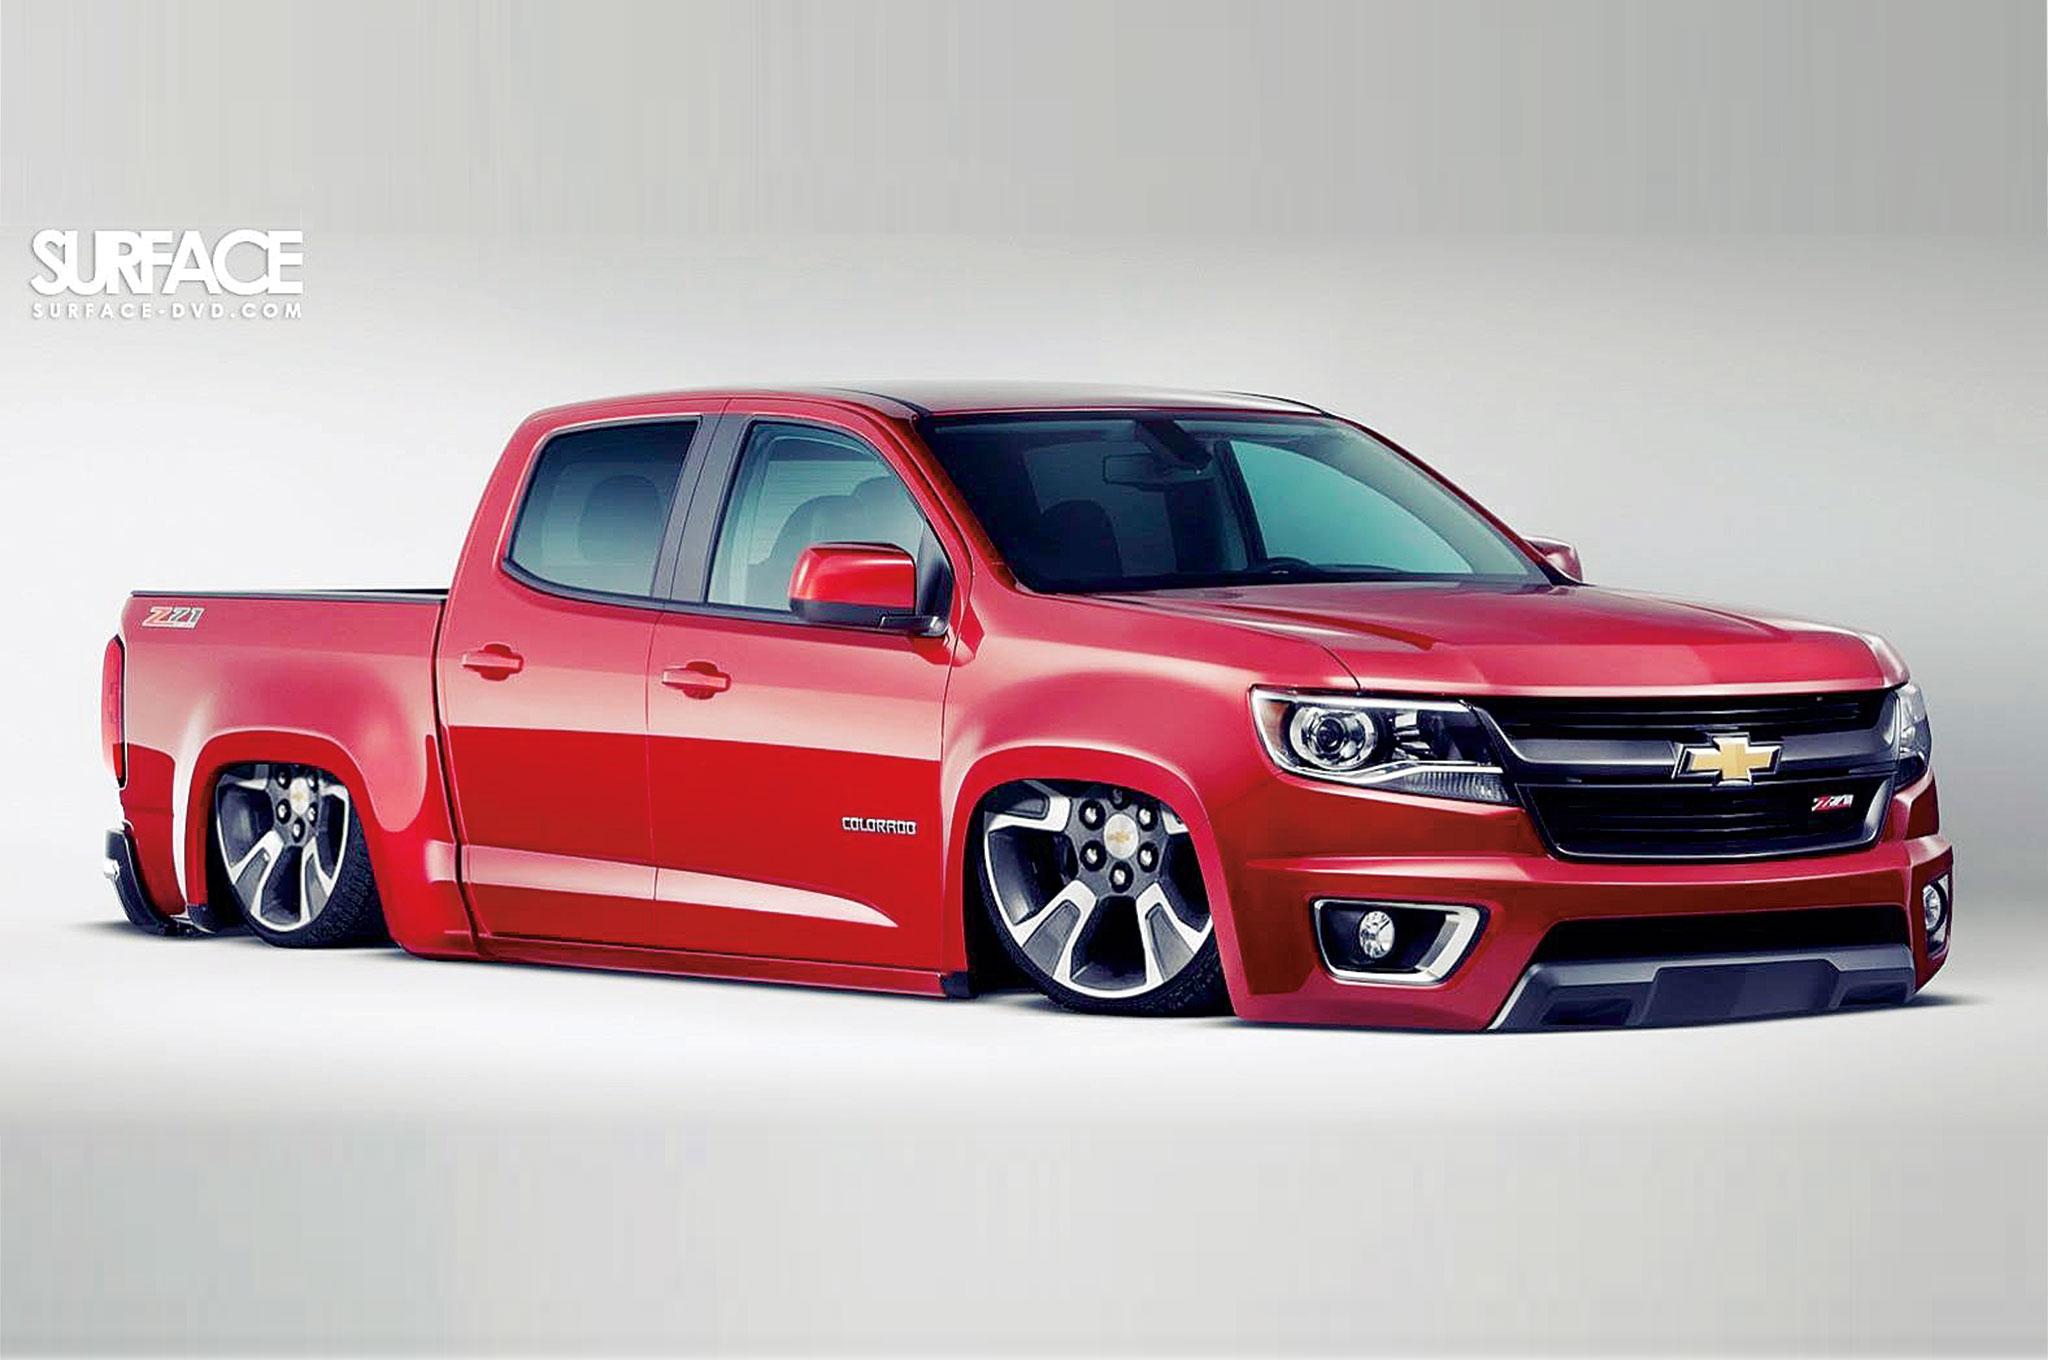 2015 Chevrolet Colorado & GMC Canyon 4 Cylinder Fuel Economy Announced